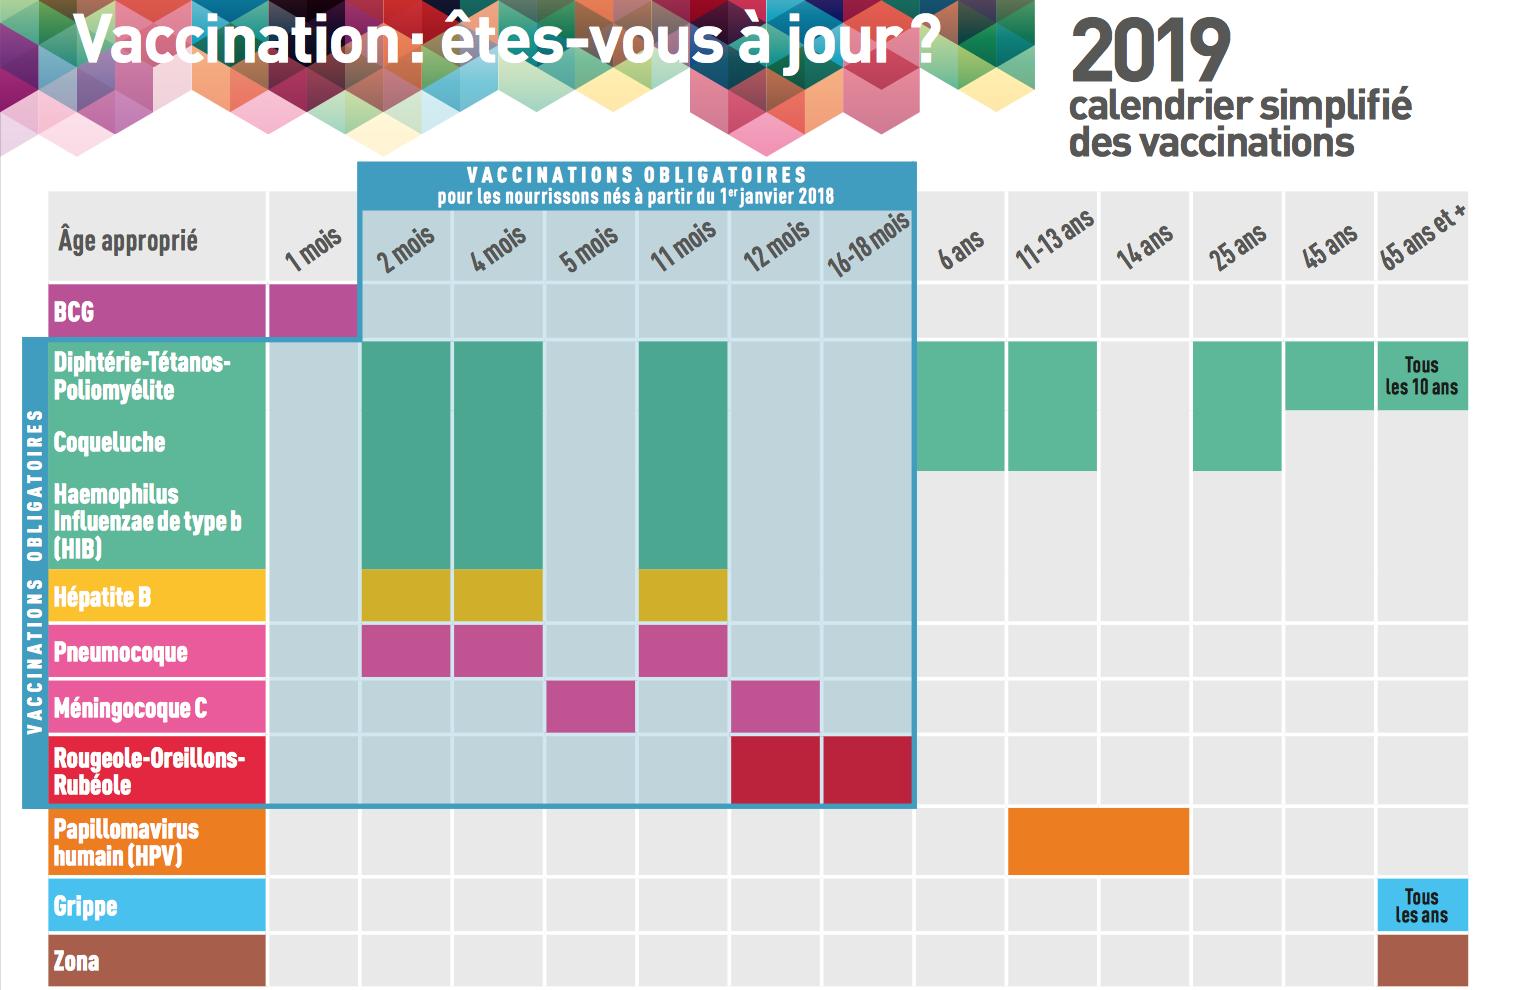 Vaccination Calendrier 2019.Le Calendrier Des Vaccinations 2019 Pediatre Online